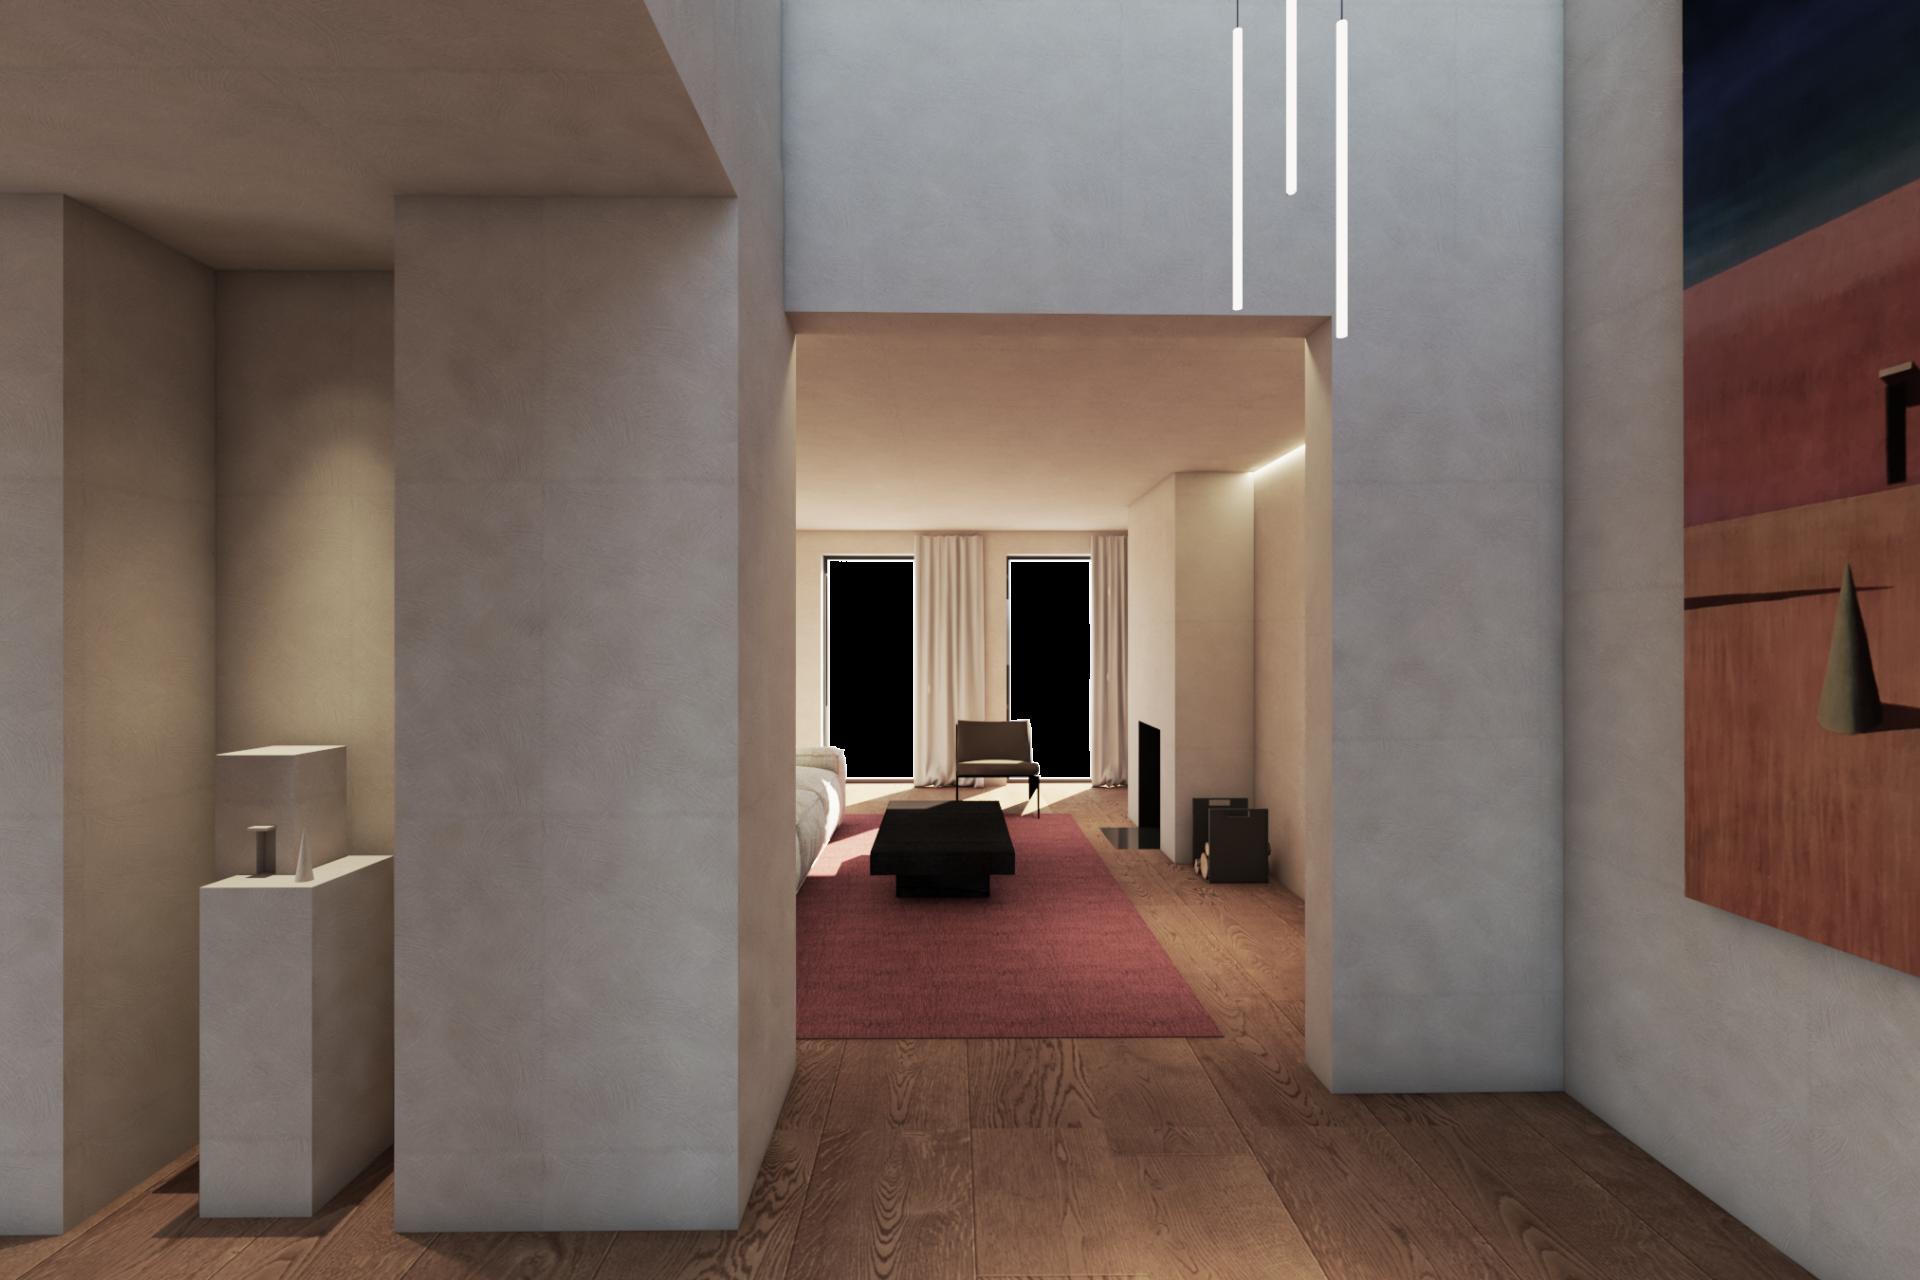 Imaginn-Hi-end-Interior-03